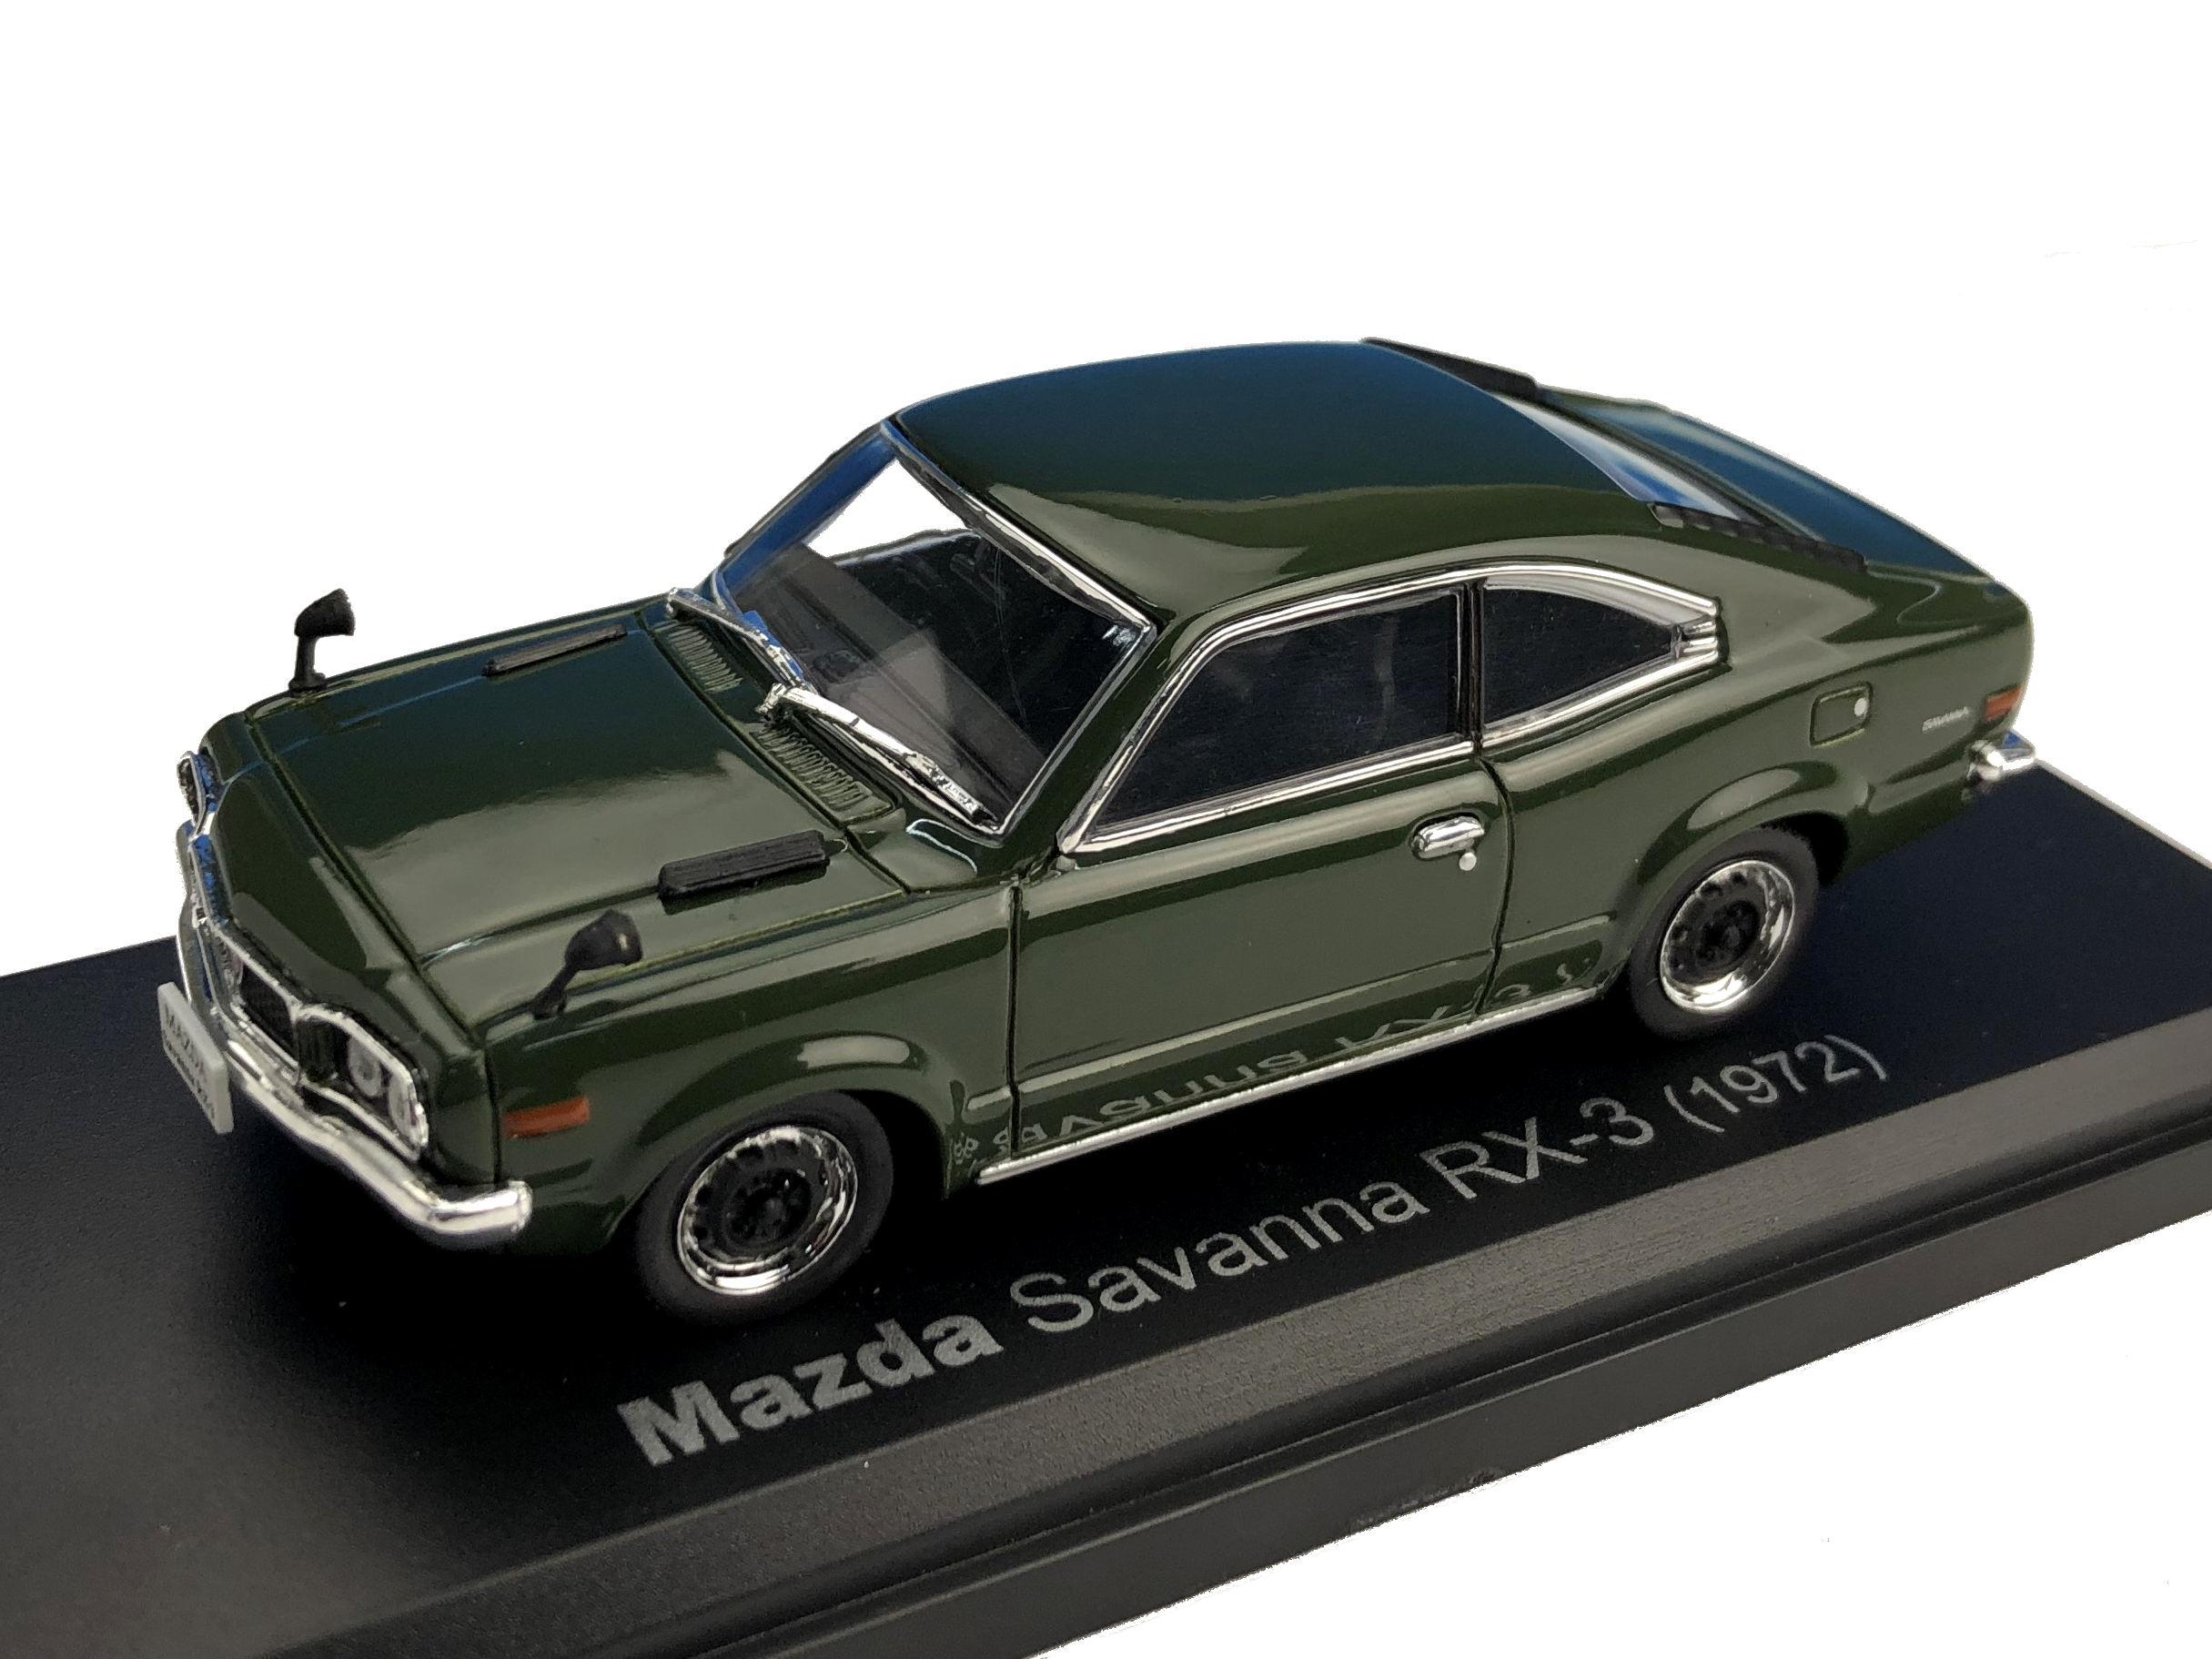 NOREV/ノレブ MAZDA SAVANNA RX-3 COUPE 1972年 ダークグリーン